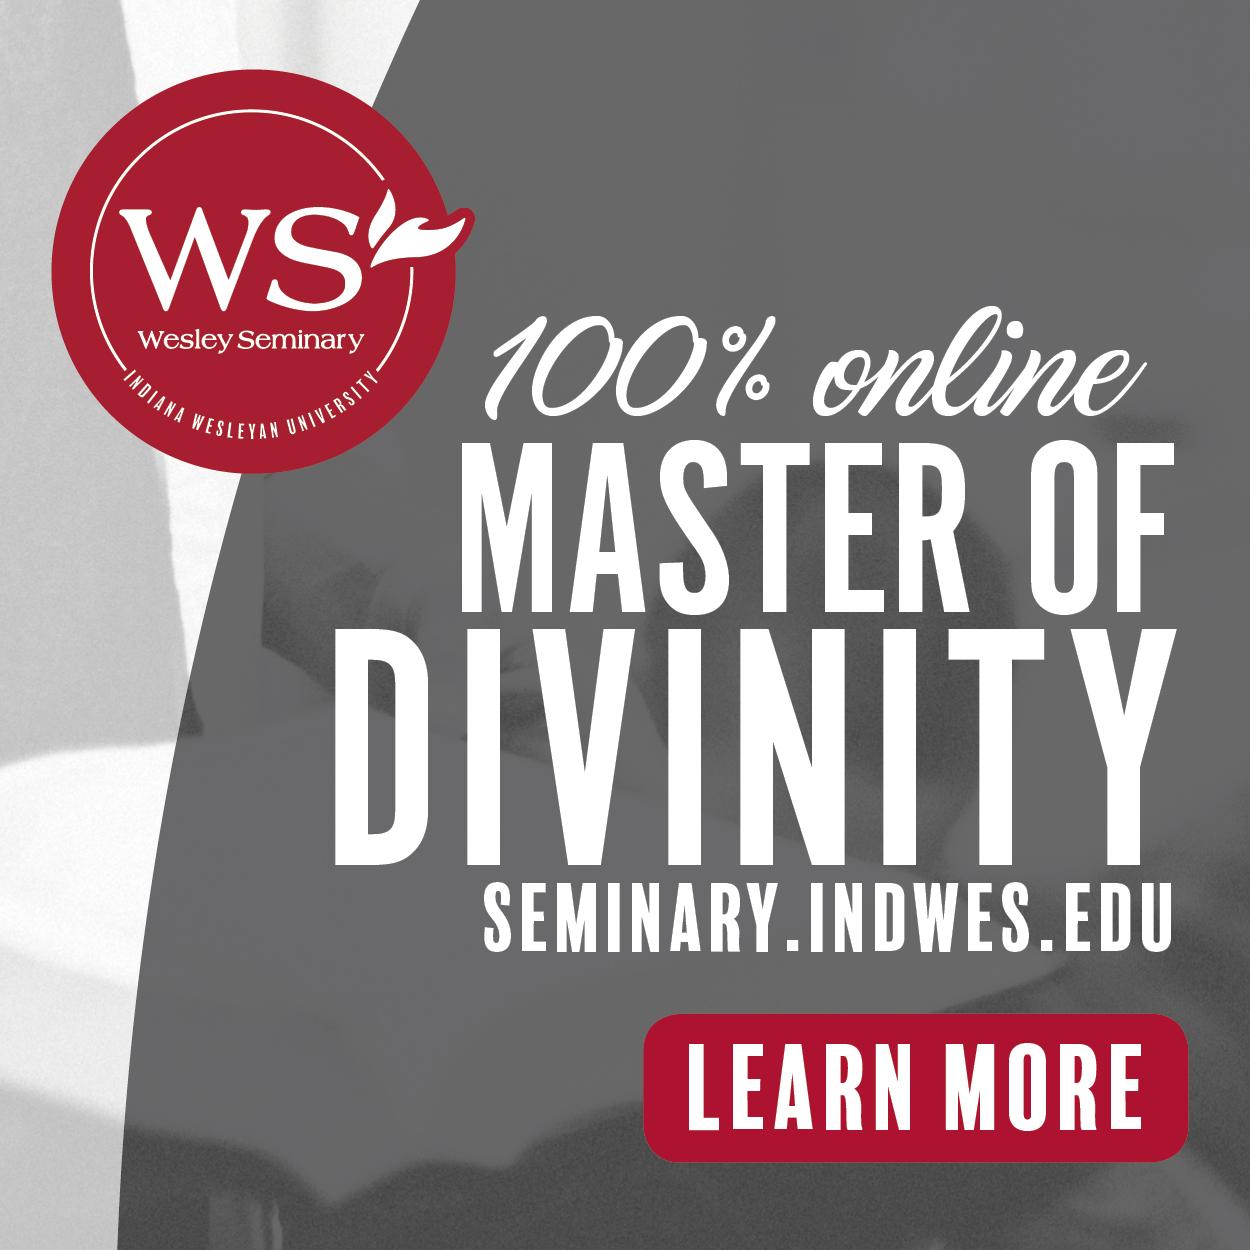 Wesley Seminar Sidebar